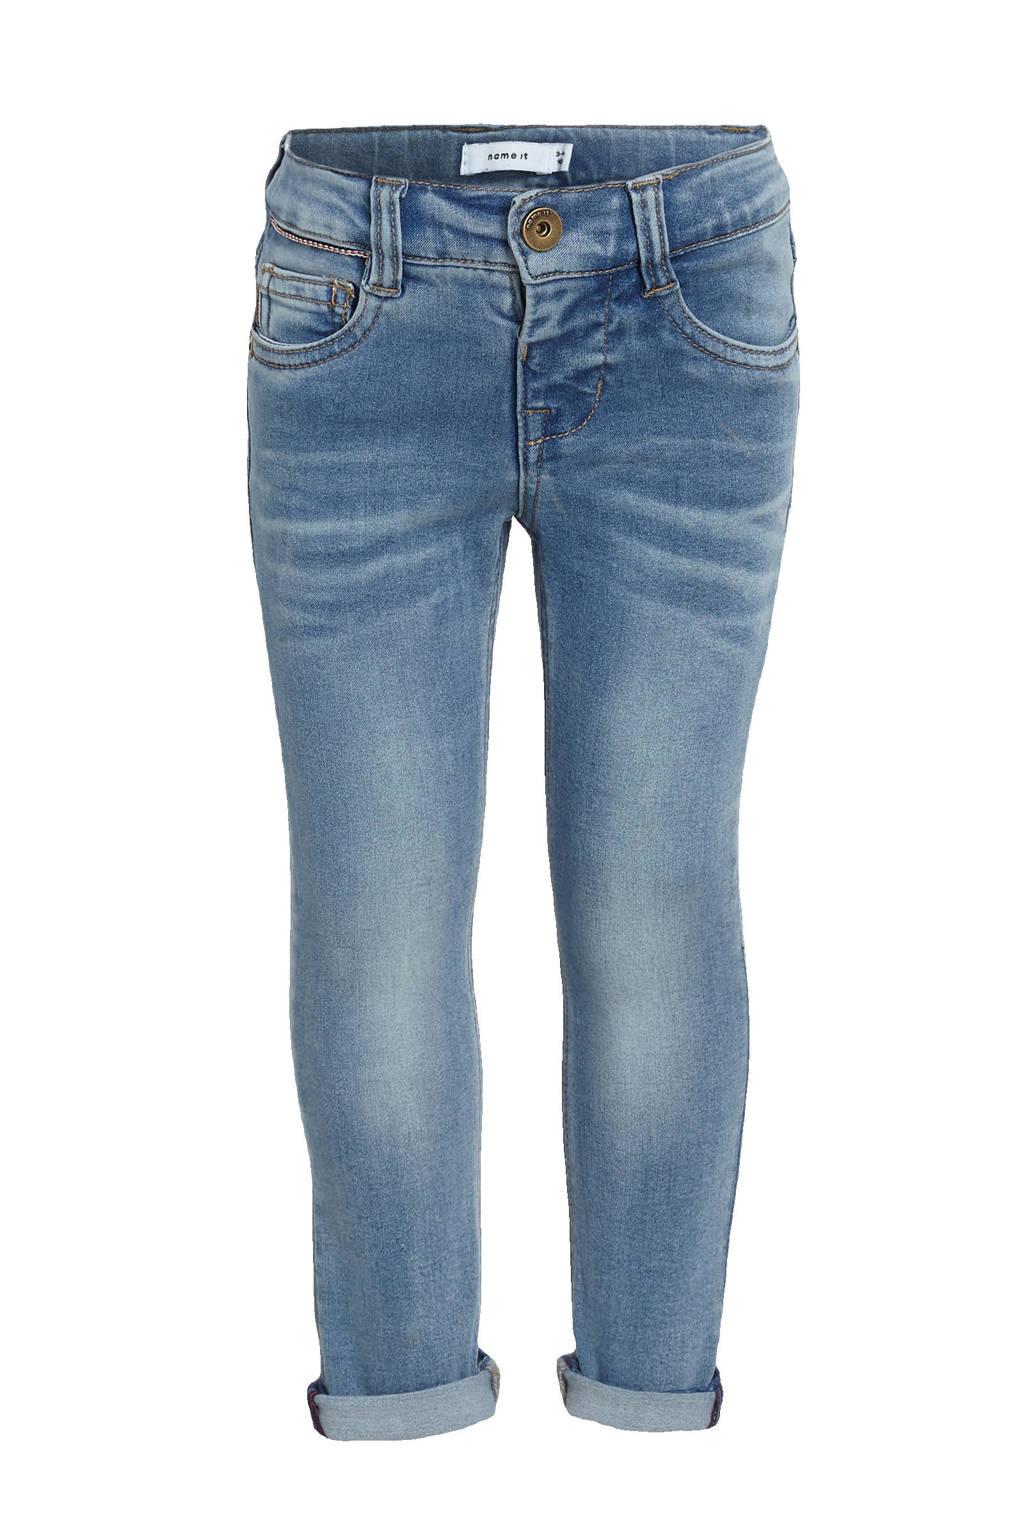 NAME IT MINI slim fit jeans Theo medium blue denim, Medium blue denim